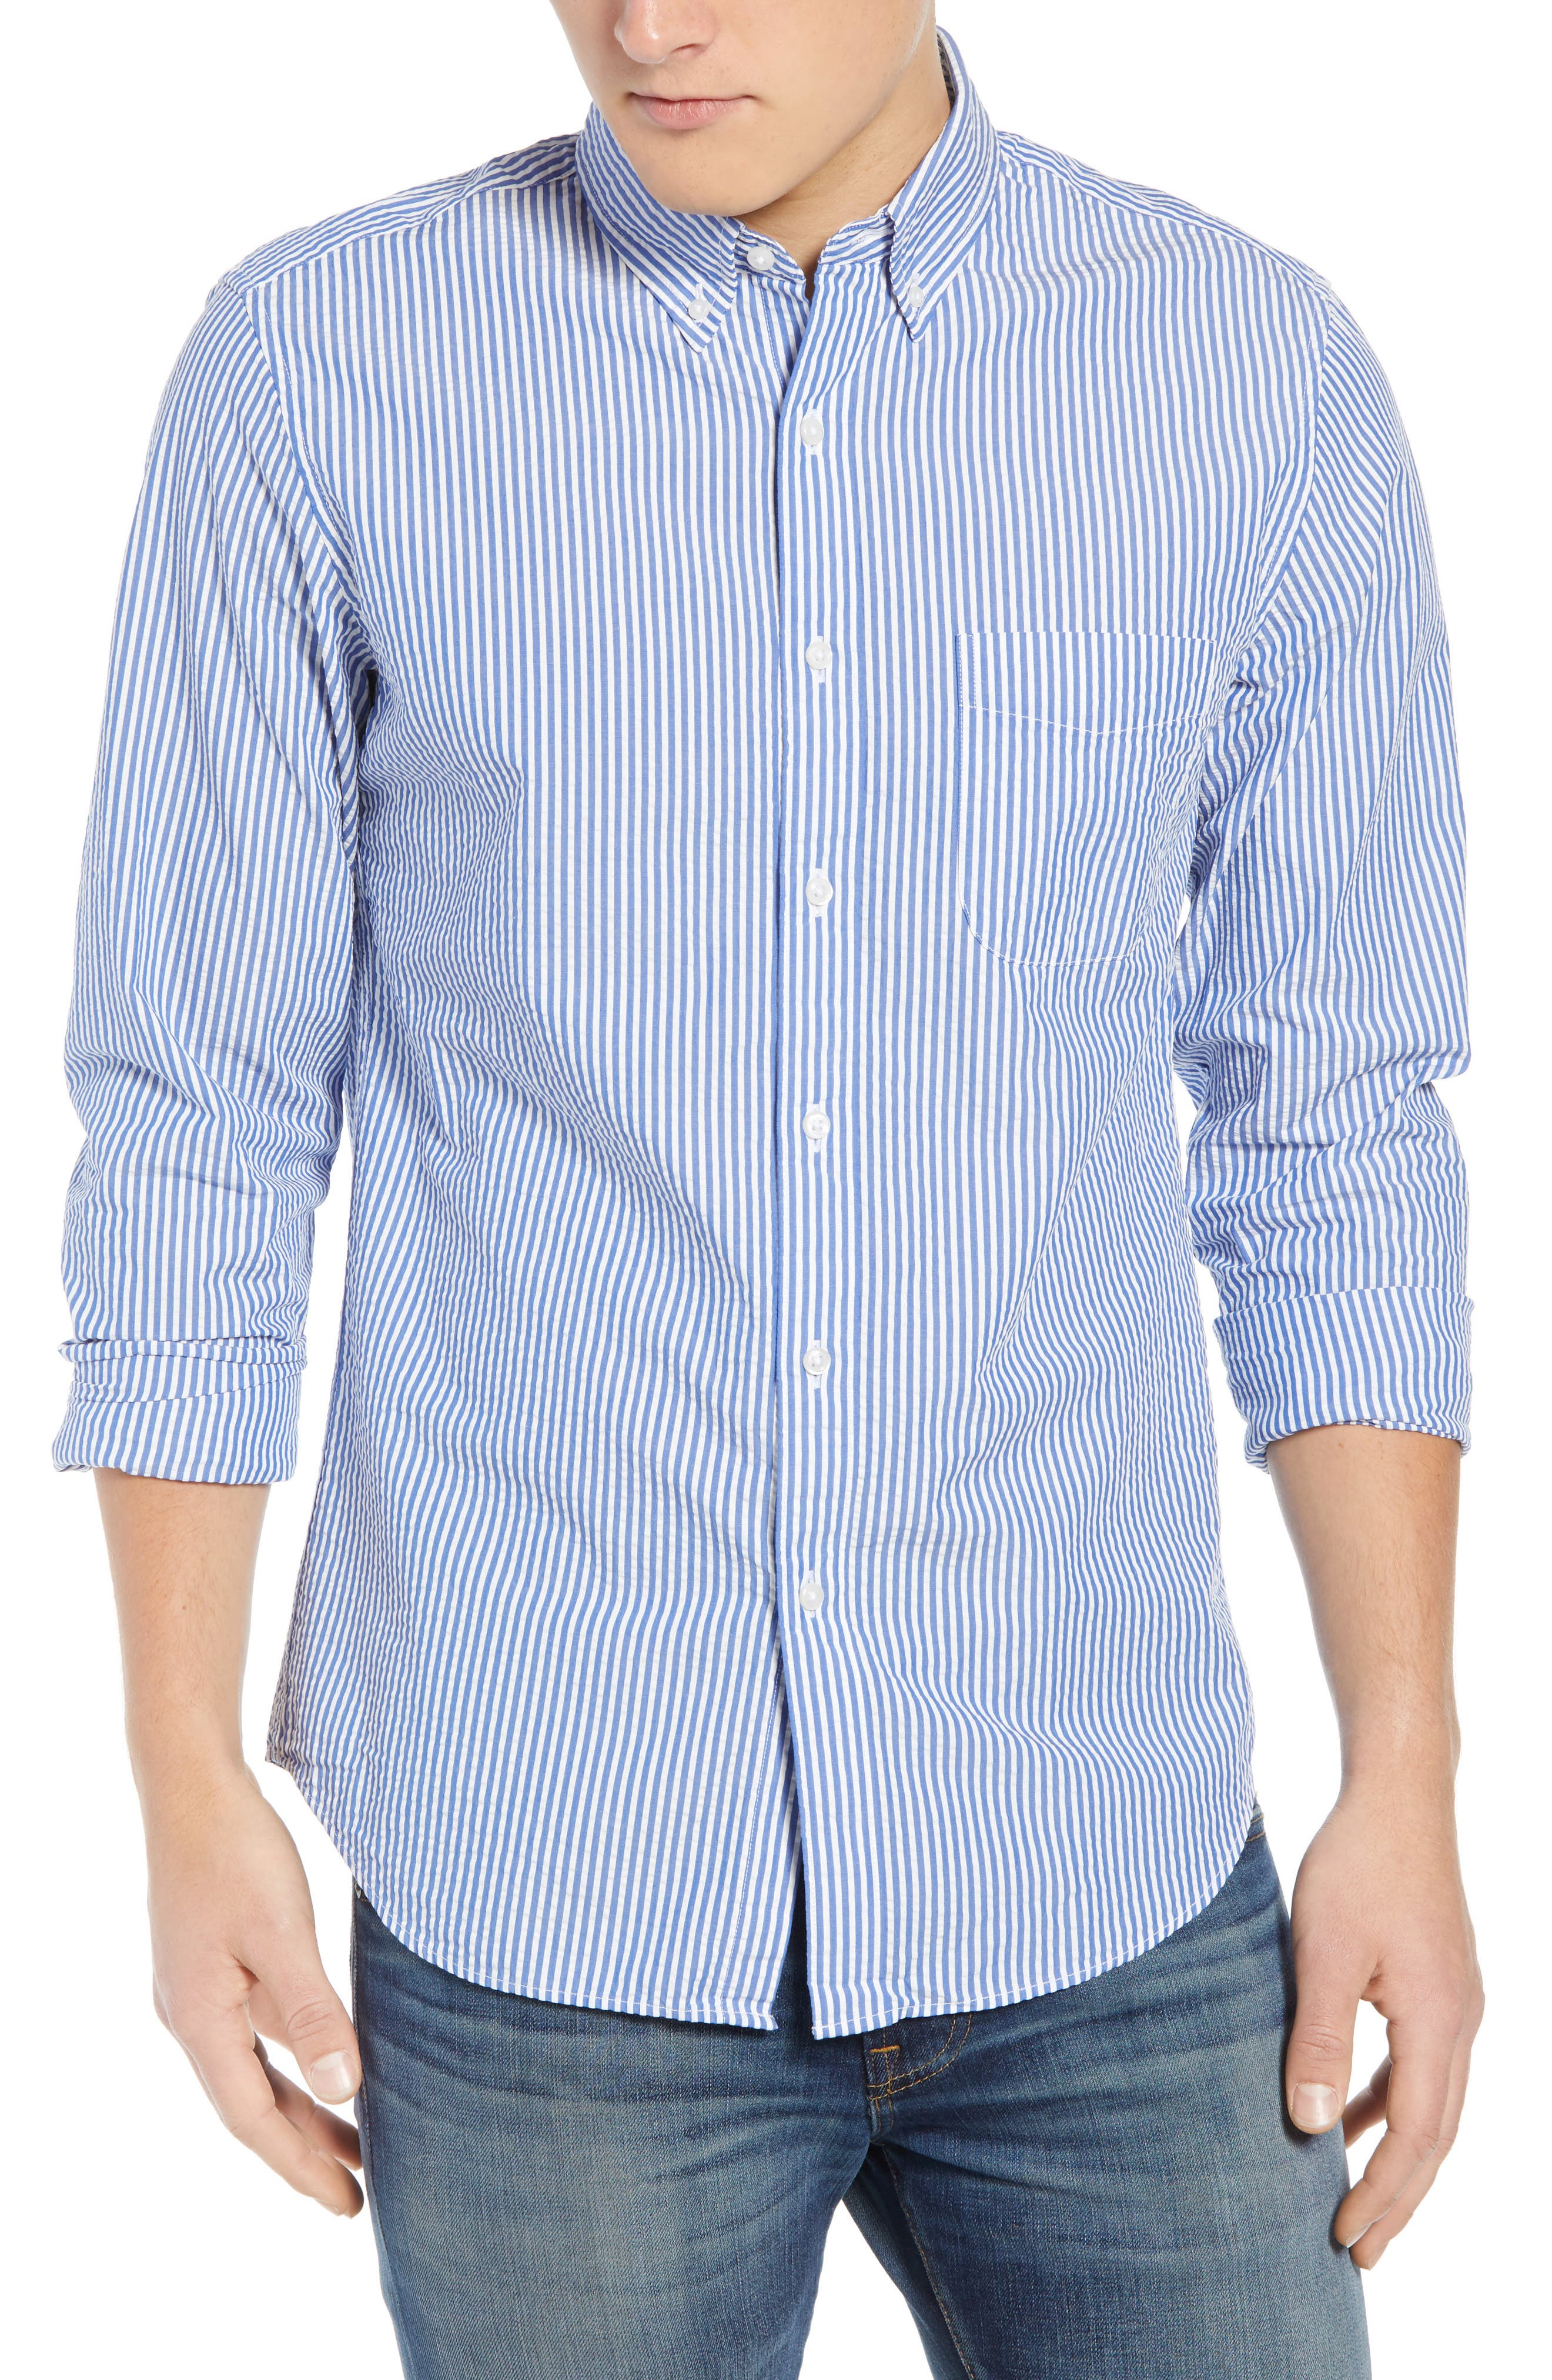 Seersucker Sport Shirt,                         Main,                         color, White Blue